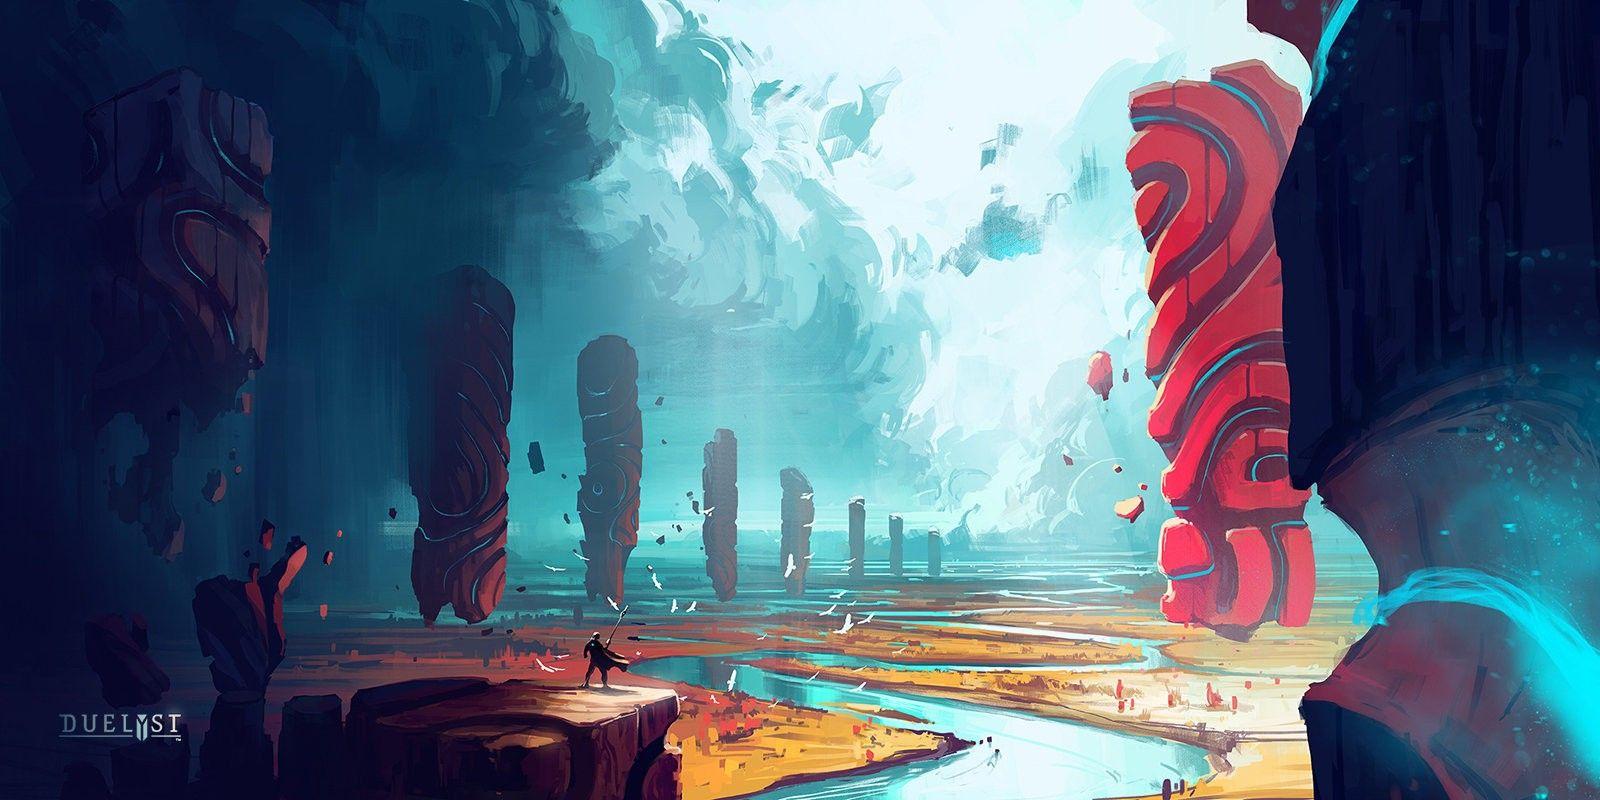 Sci Fi Anime Landscape Art Environment Concept Art Animation Art Environmental Art